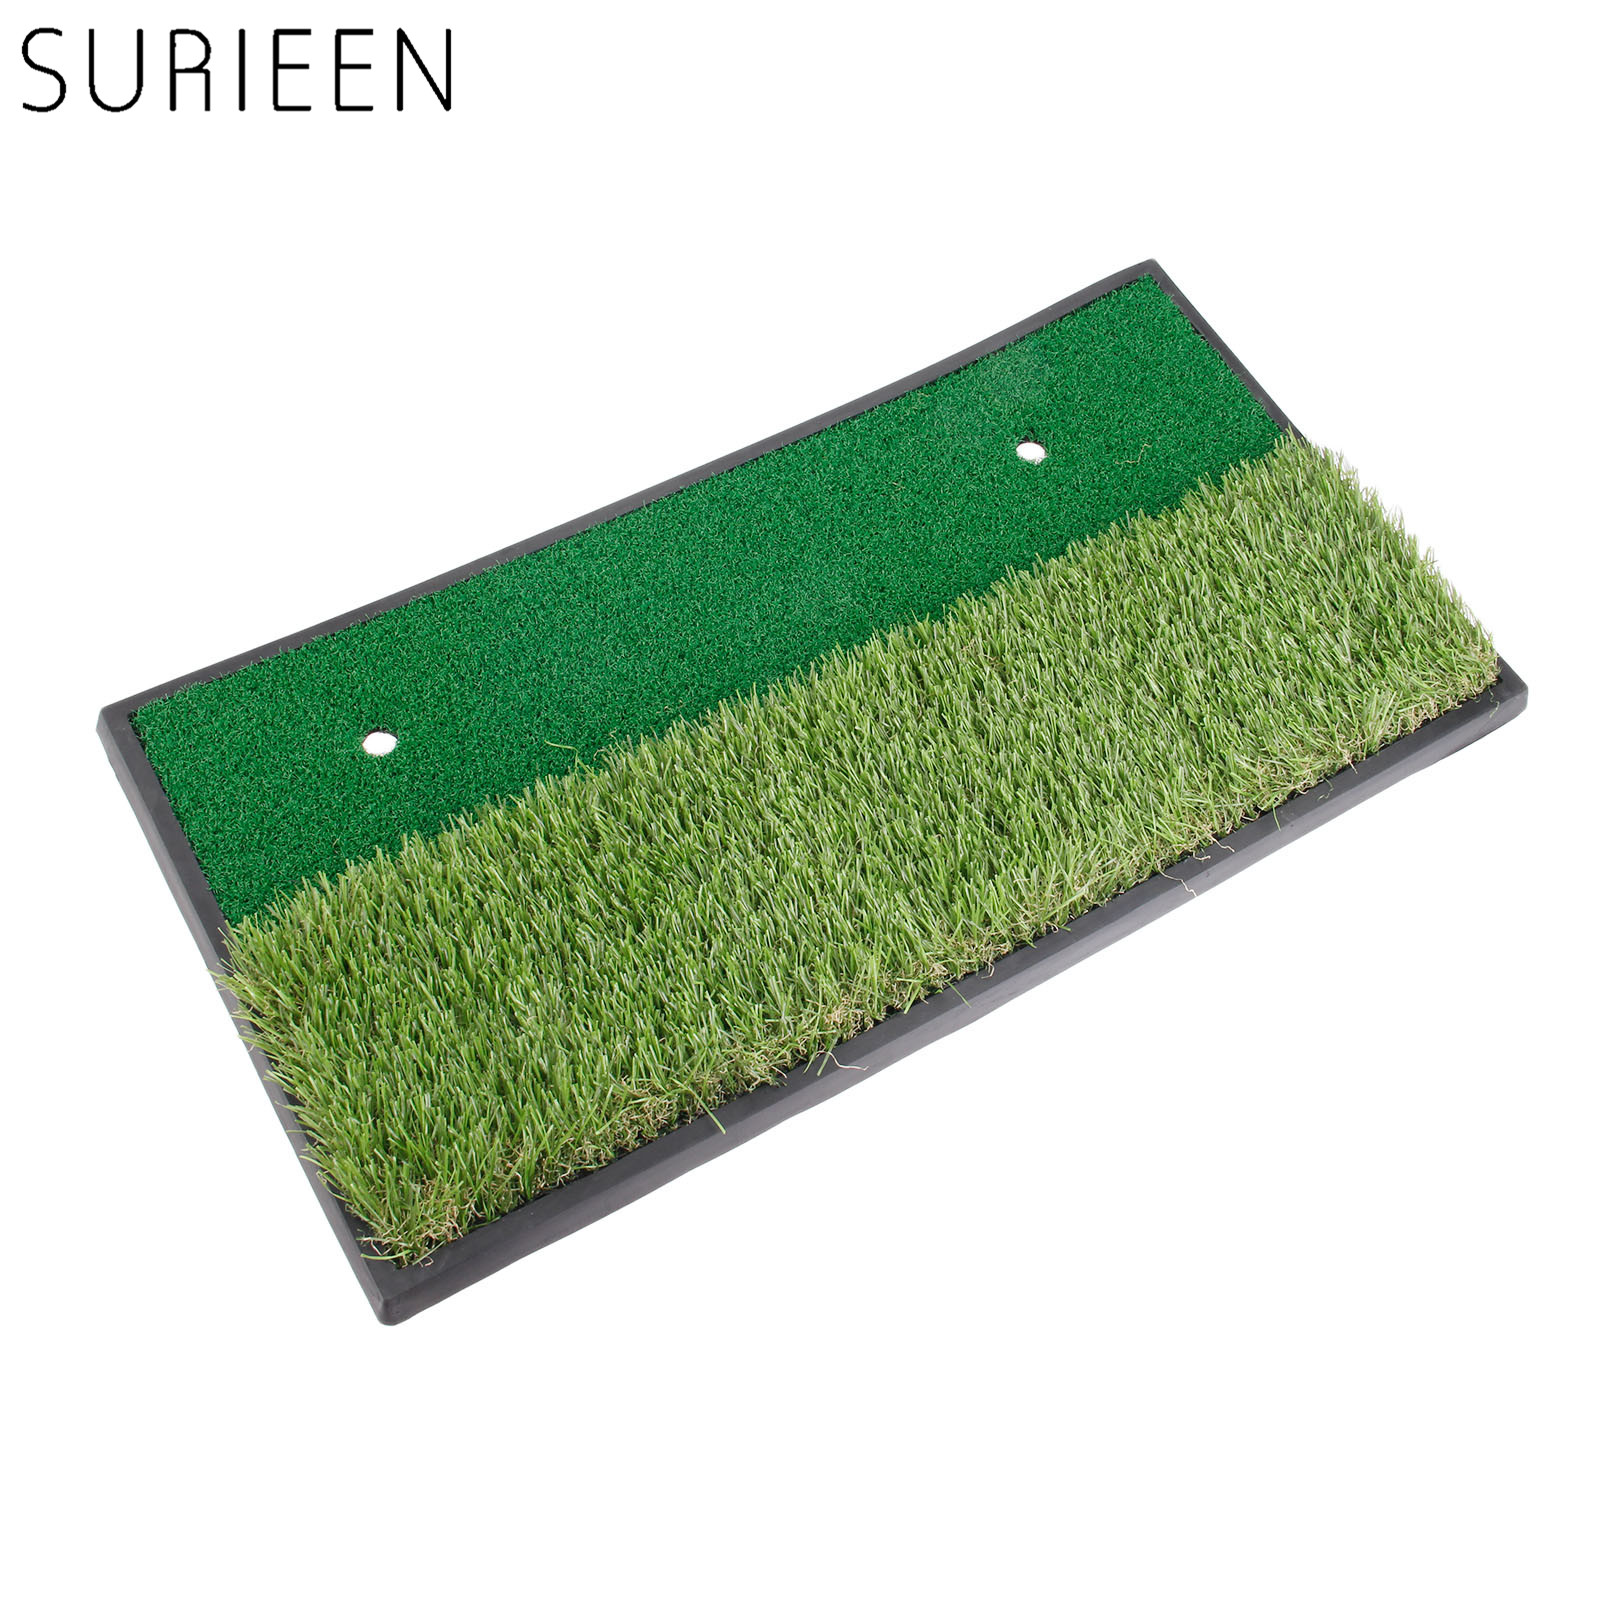 цена на SURIEEN 1pc Backyard Golf Mat 60x30cm Indoor Training Hitting Pad Practice Rubber Tee Holder Eco-friendly Green Golf Hitting Mat